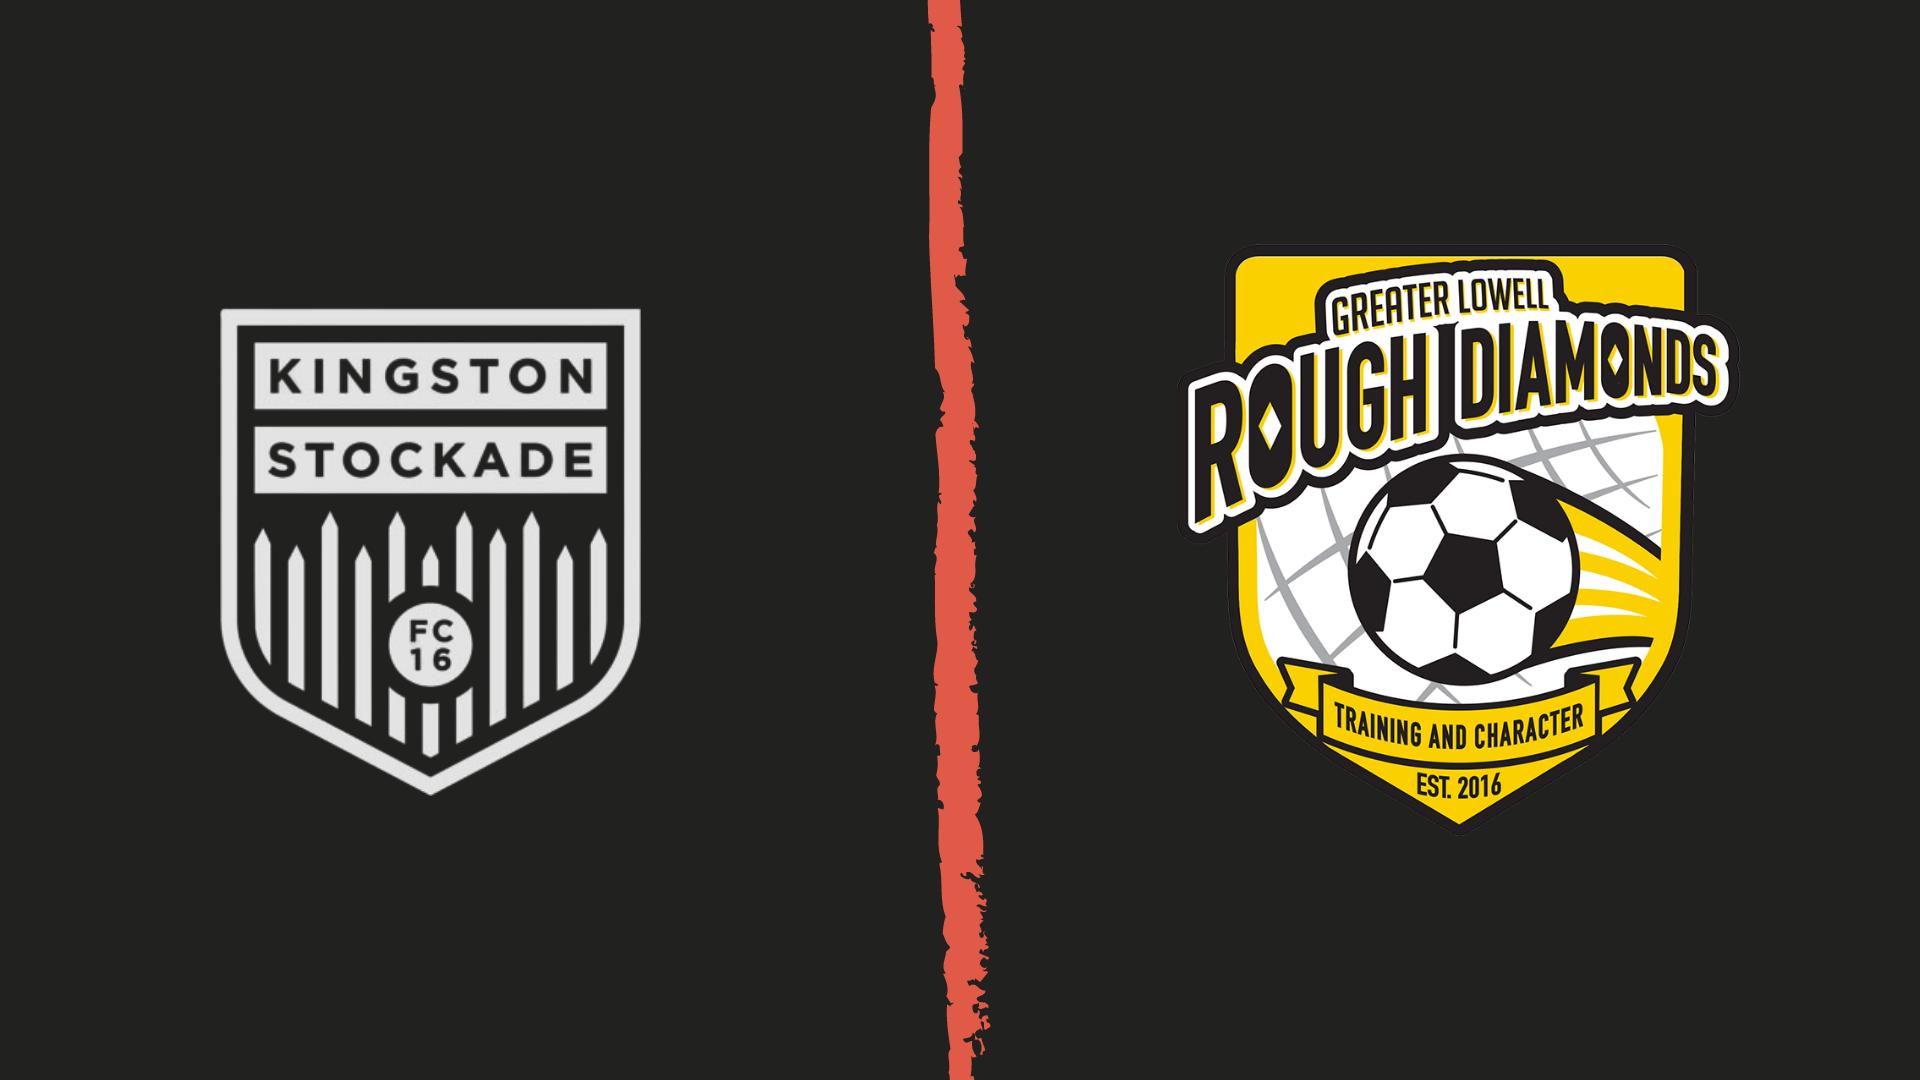 Kingston Stockade FC vs Rough Diamonds